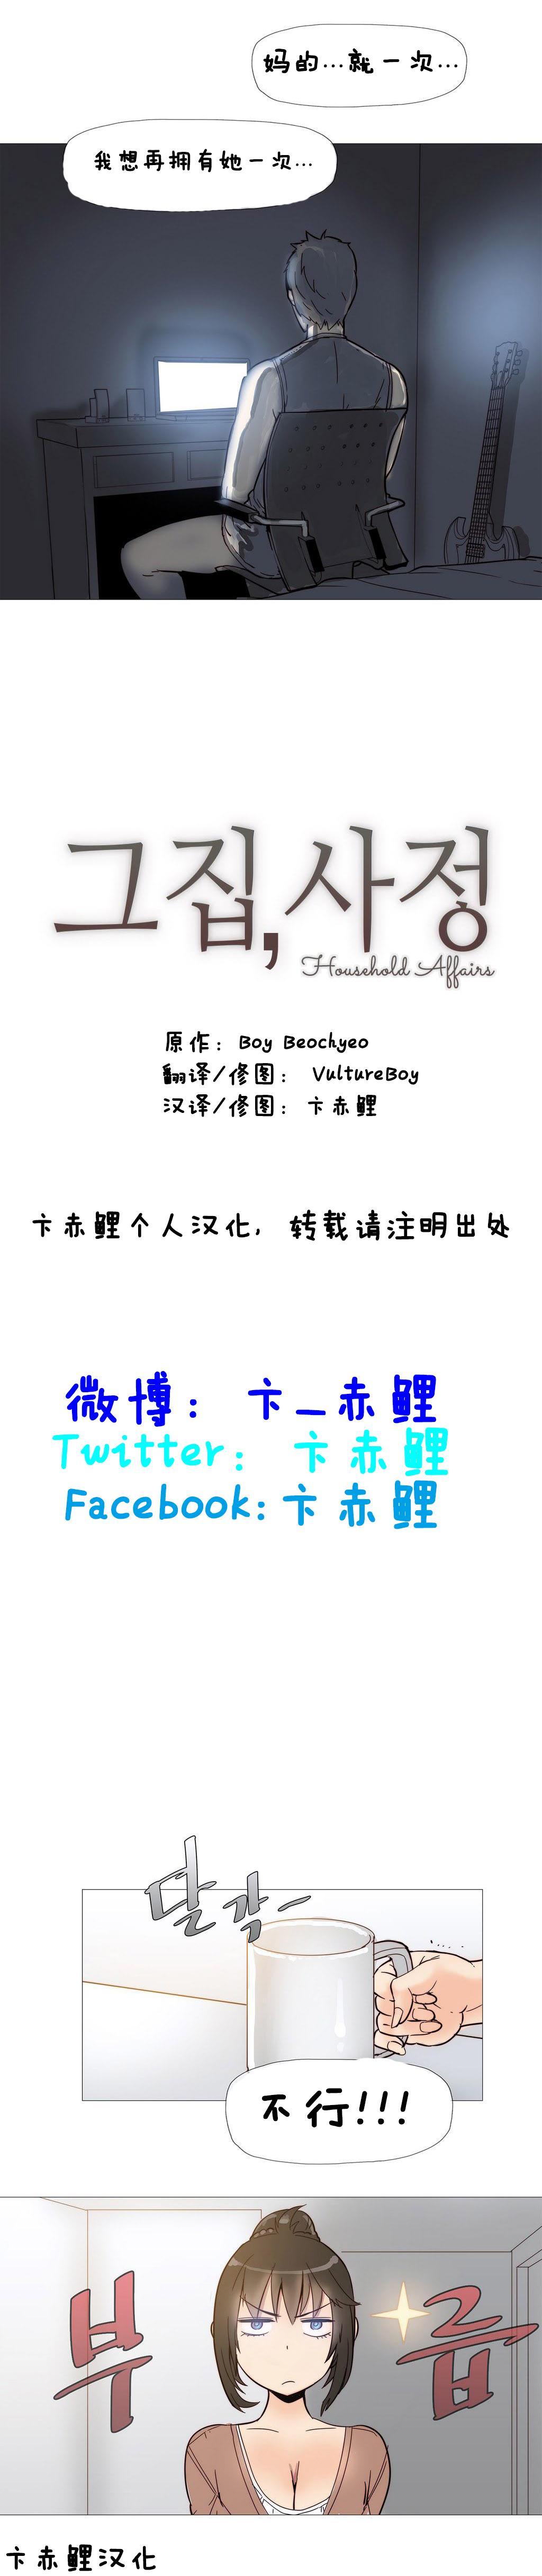 HouseHold Affairs 【卞赤鲤个人汉化】1~21话(持续更新中) 57